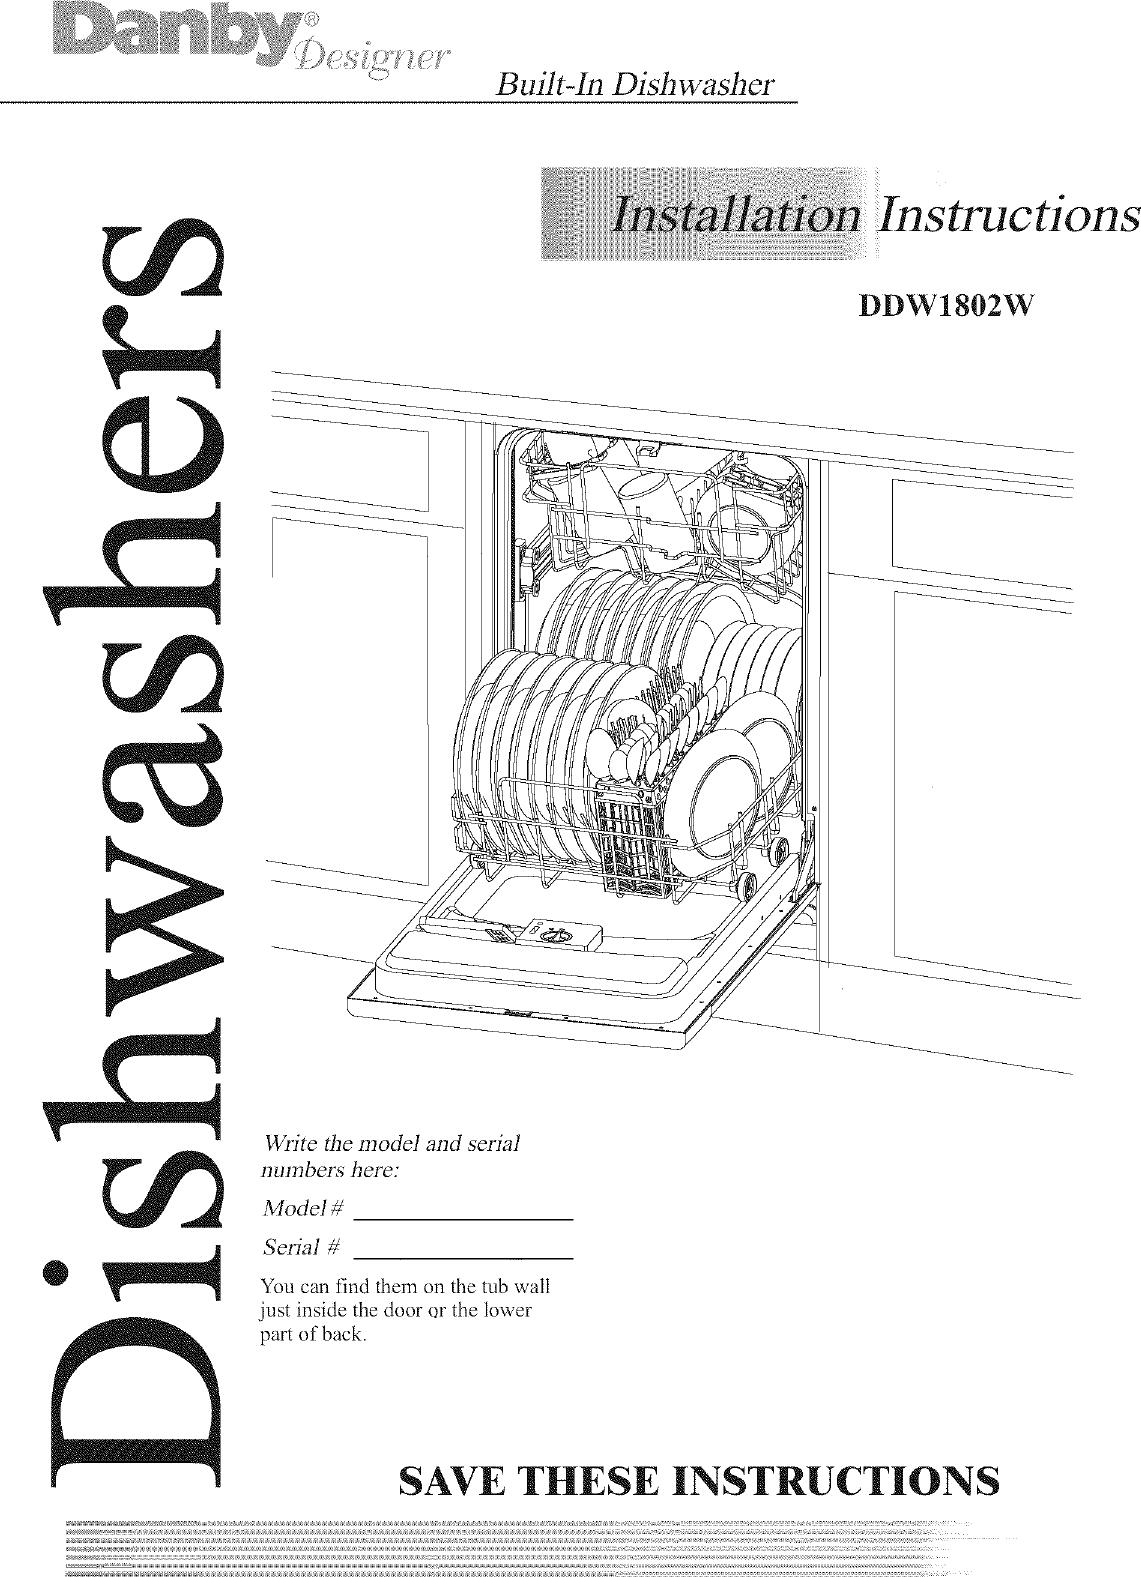 danby wiring diagram wiring diagramdanby ddw1802w user manual dishwasher manuals and guides l0712165 danby wiring diagram